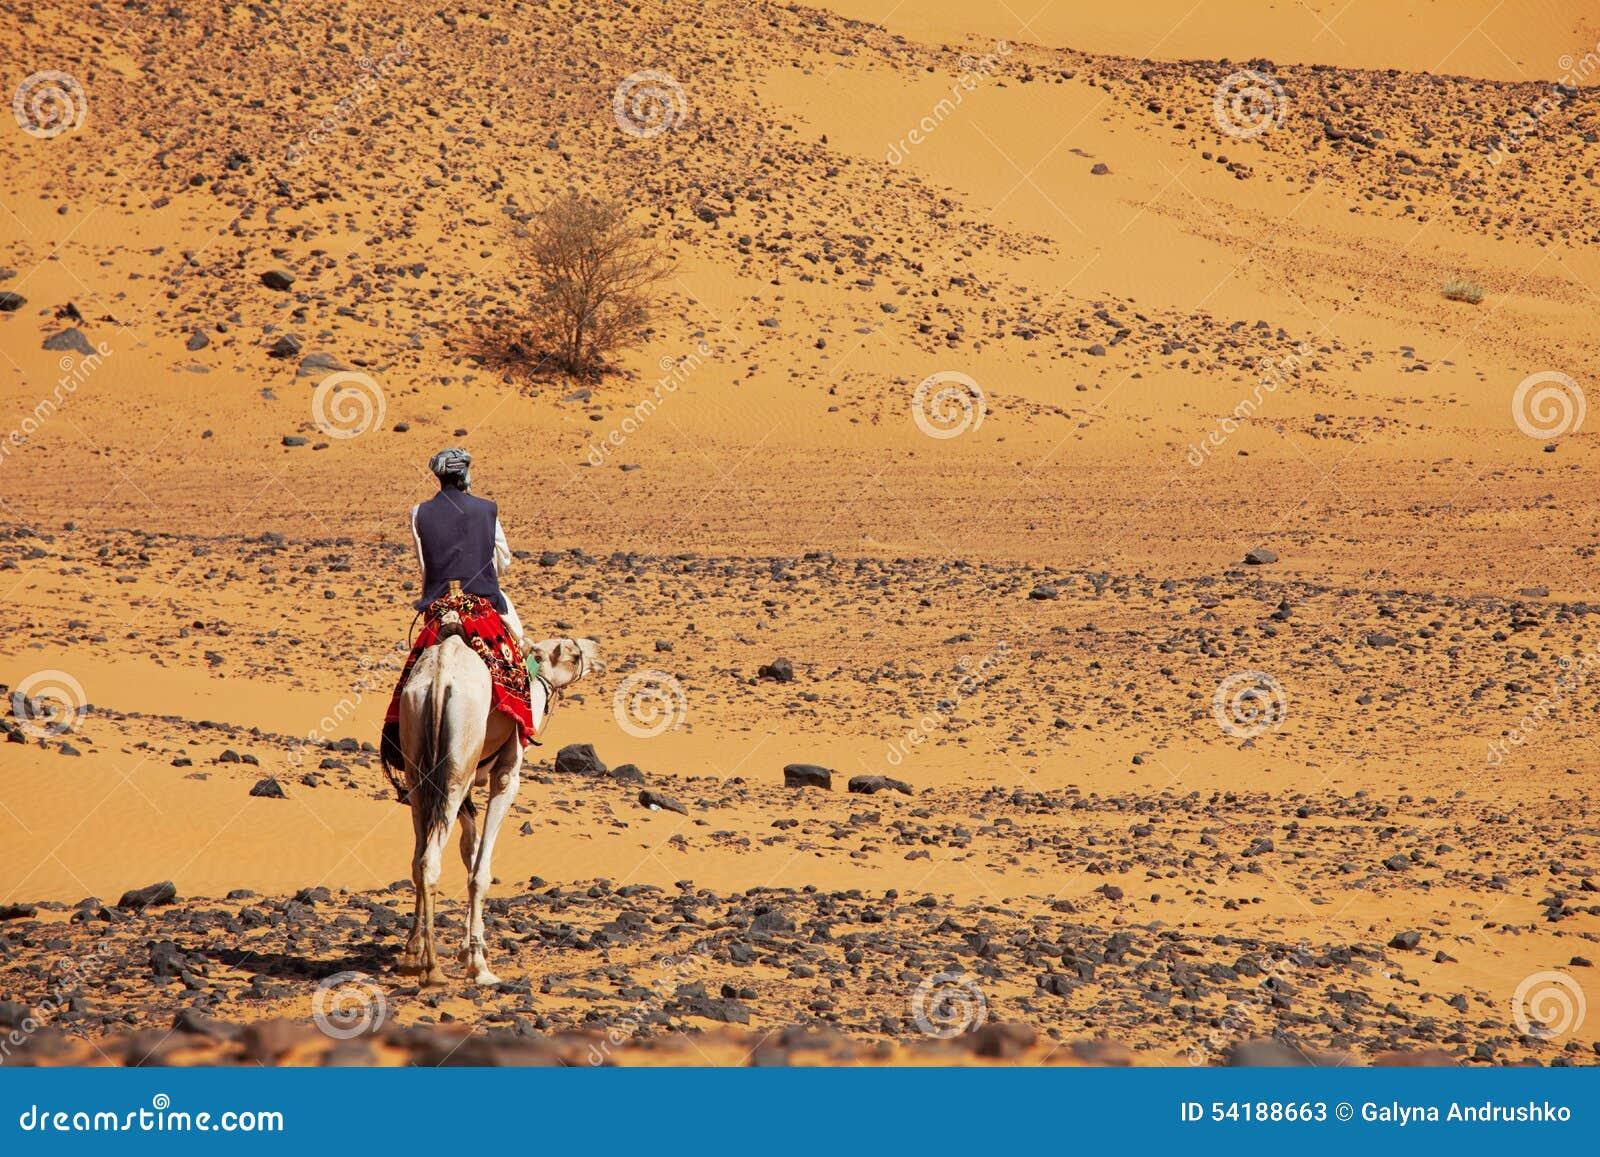 Sudanese camel rider